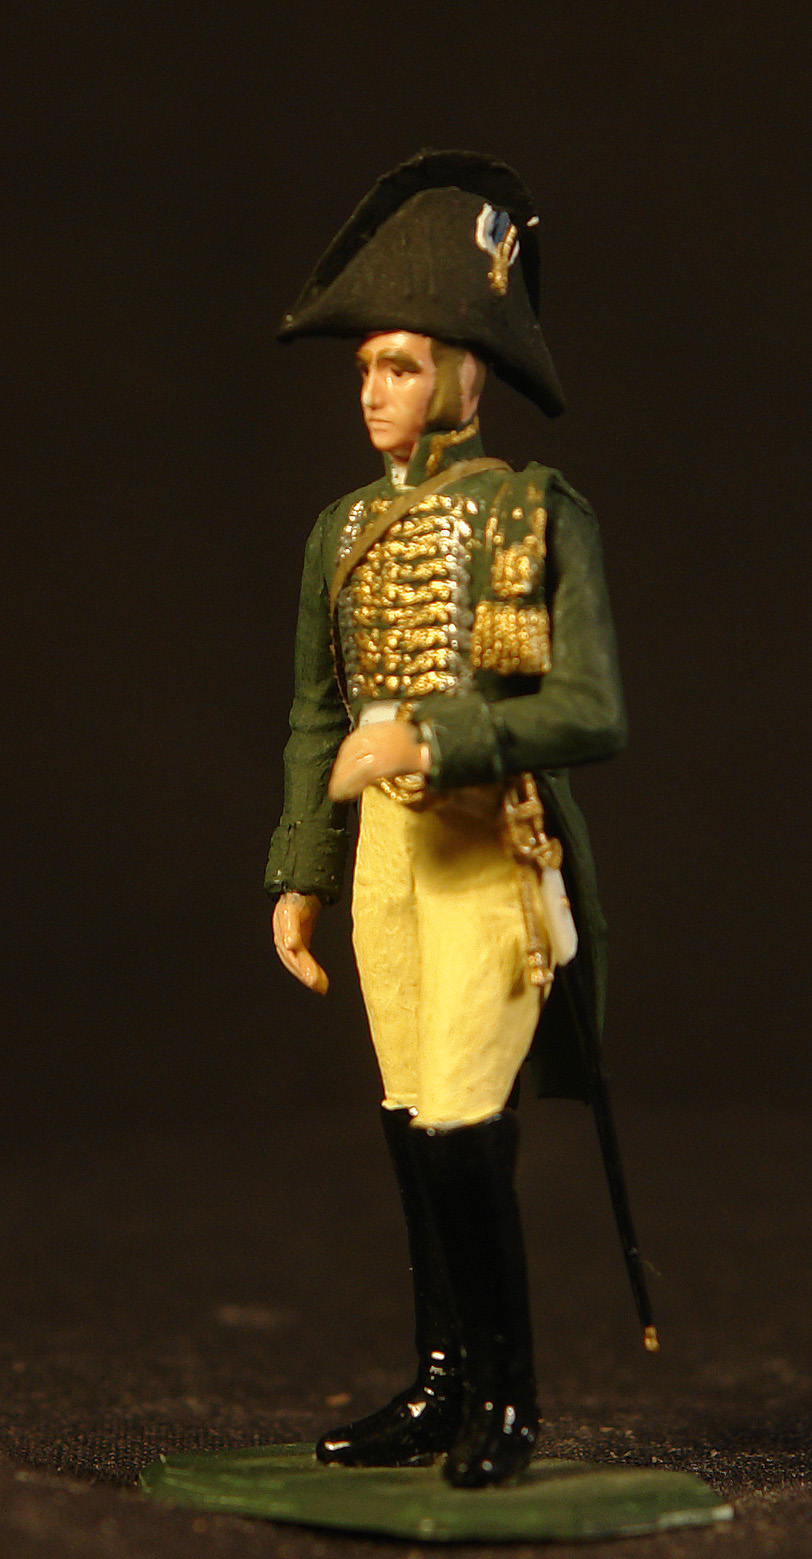 1808-Fransk-ordonans-officer-i-den-Kejserlige-garde